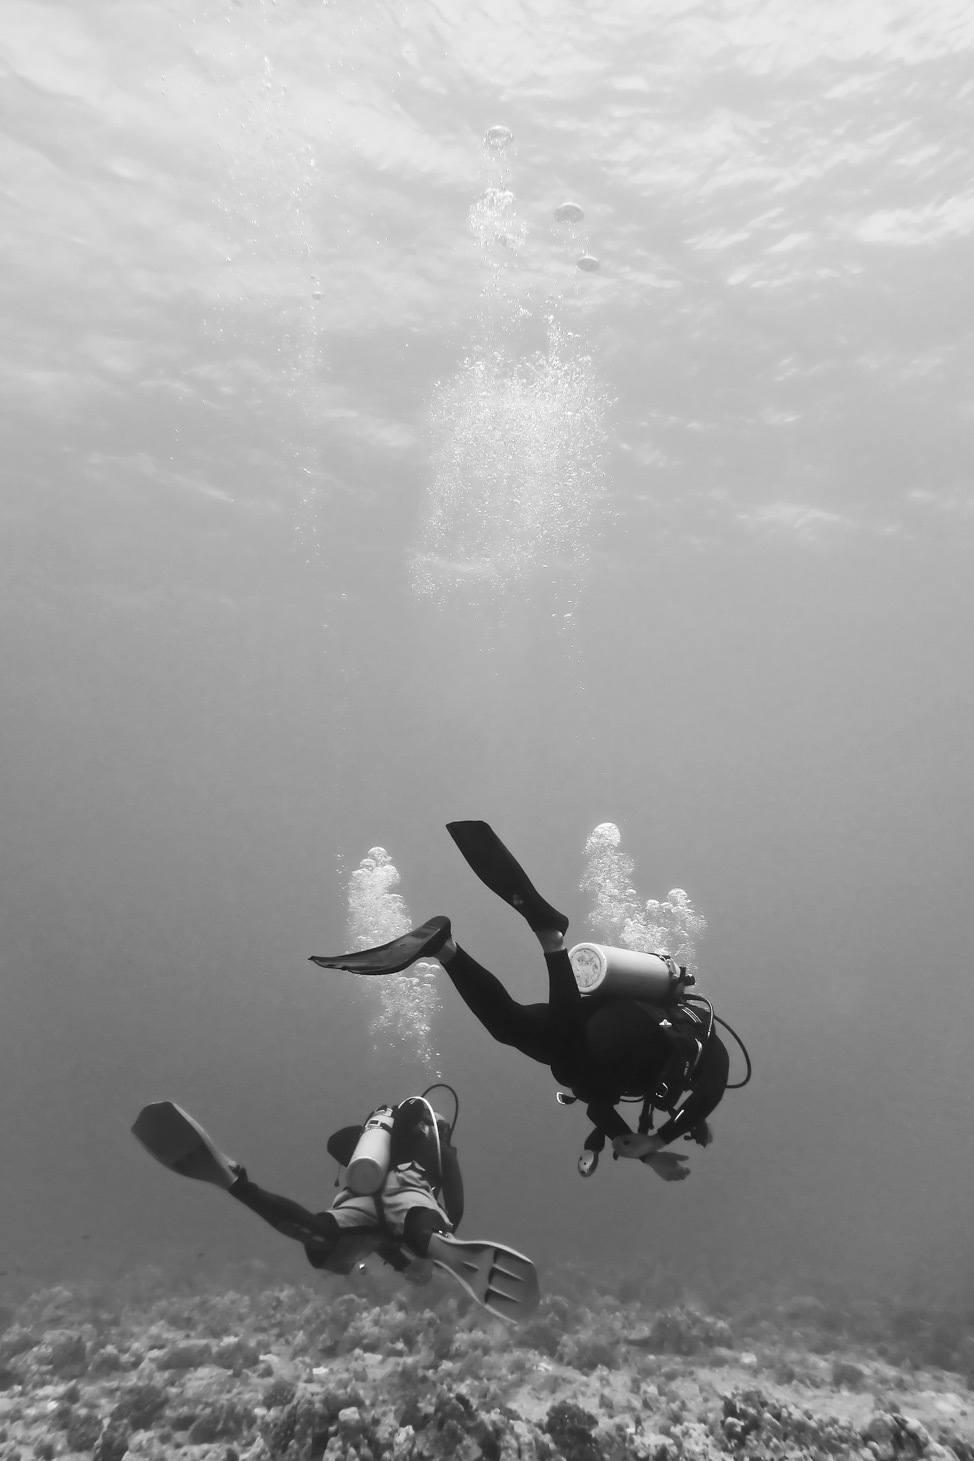 Scuba diving on Oahu